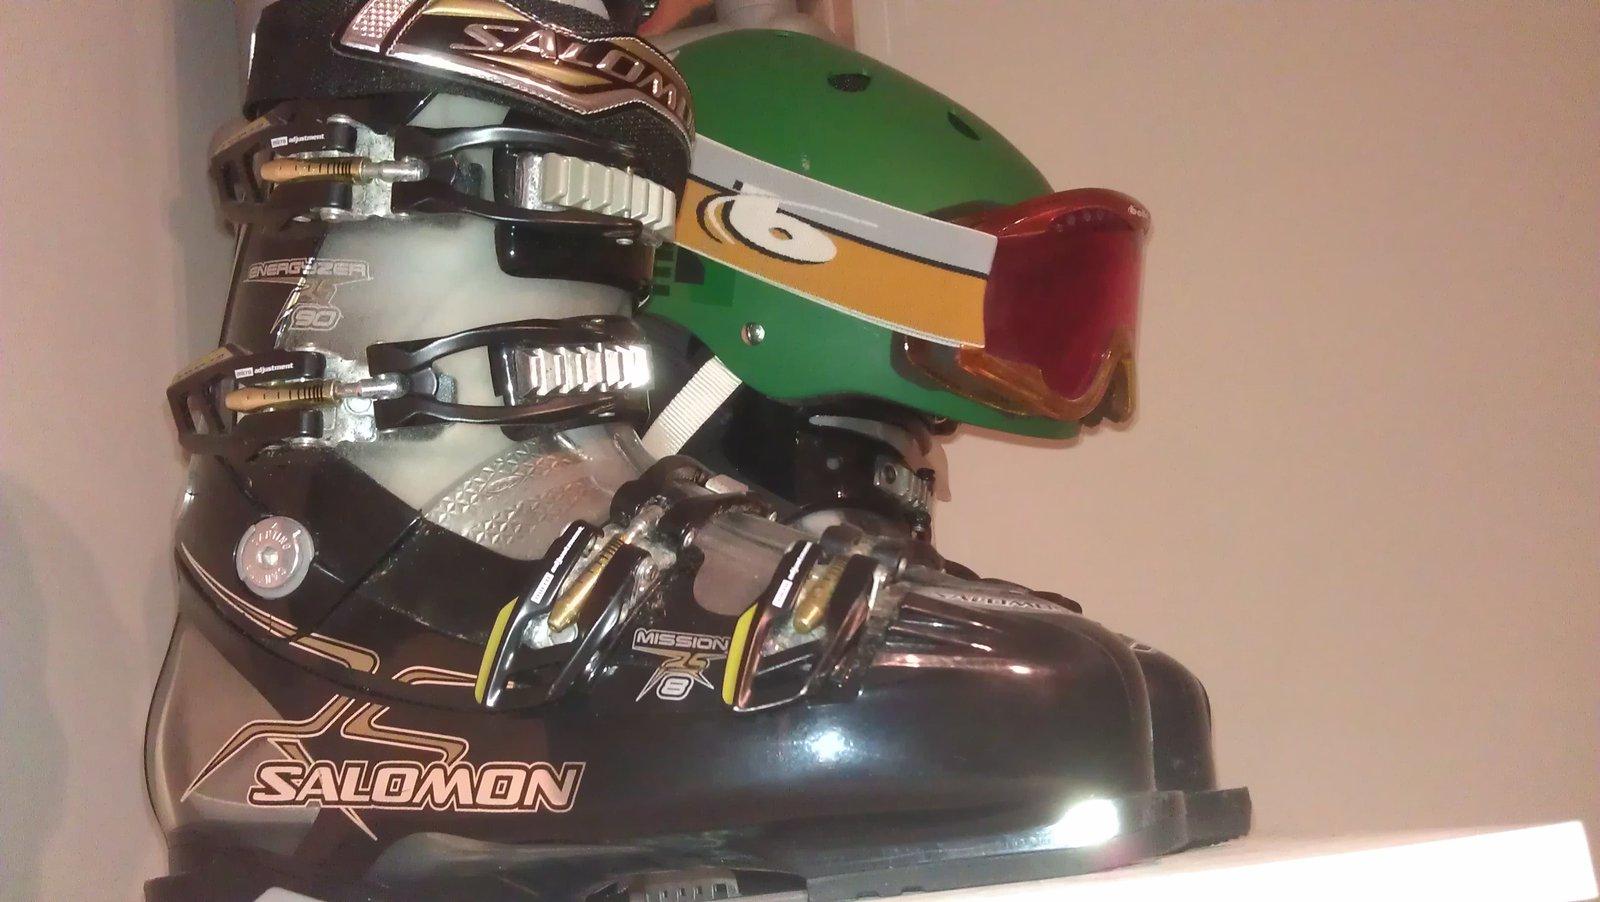 Salomon RS 80's